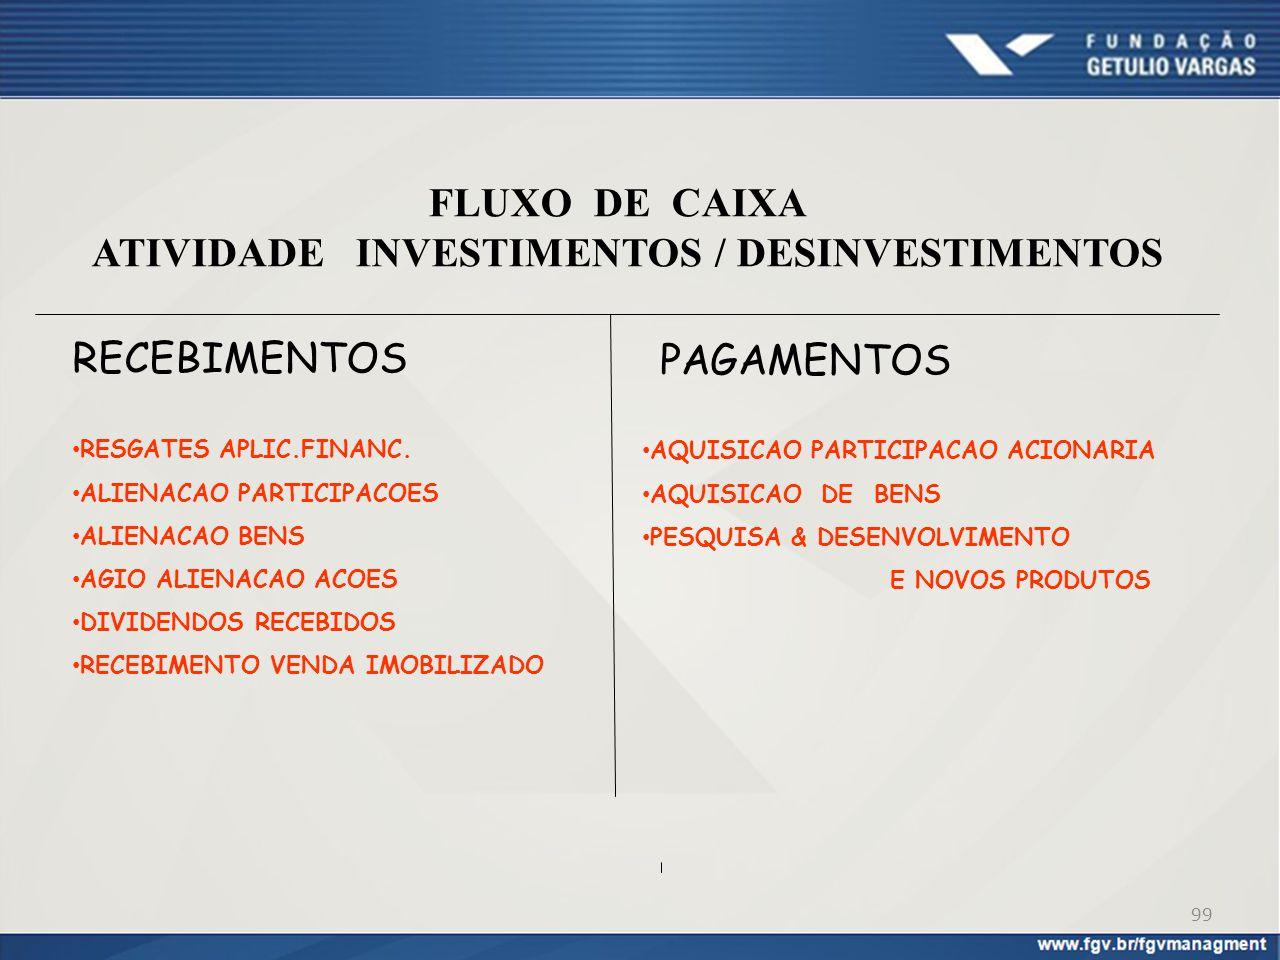 99 FLUXO DE CAIXA ATIVIDADE INVESTIMENTOS / DESINVESTIMENTOS RESGATES APLIC.FINANC. ALIENACAO PARTICIPACOES ALIENACAO BENS AGIO ALIENACAO ACOES DIVIDE